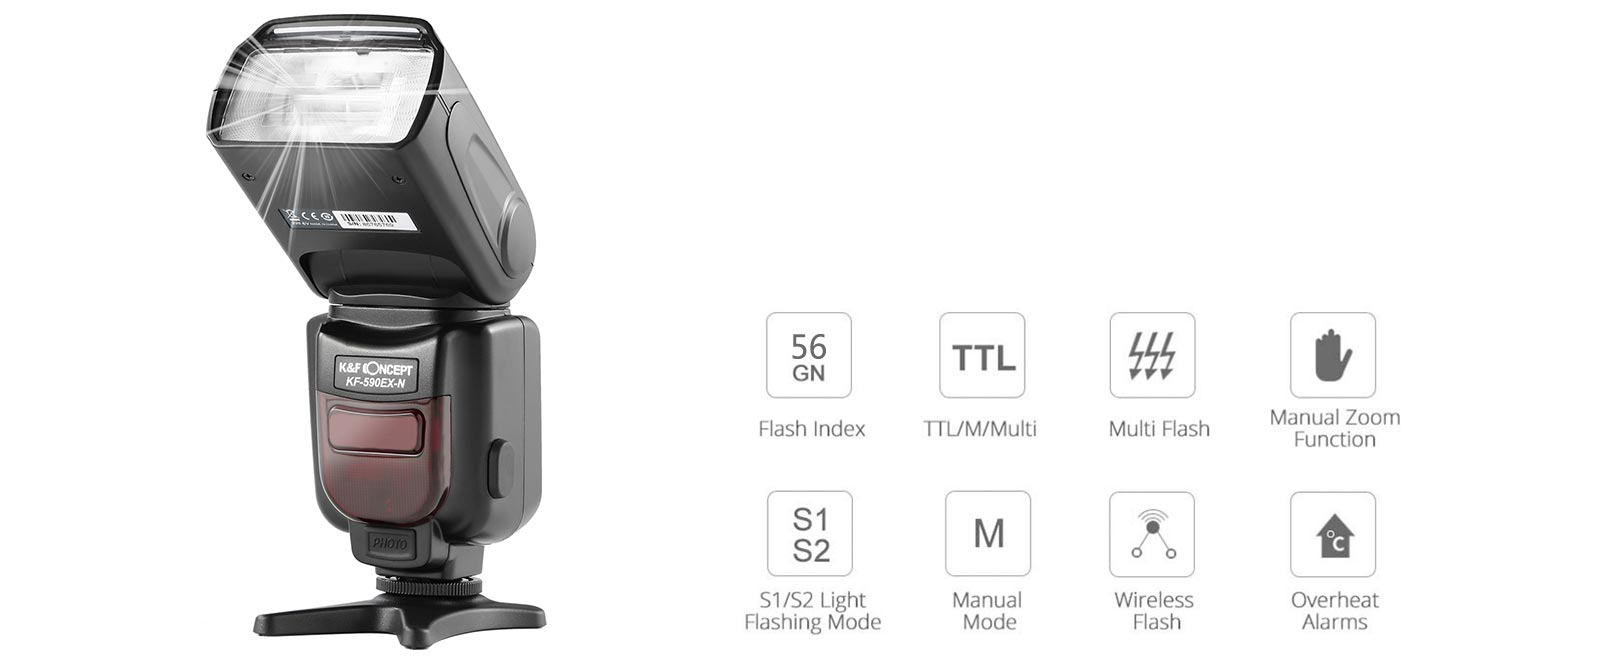 K&F Concept KF590N TTLフラッシュ ストロボ Nikon DSLR用